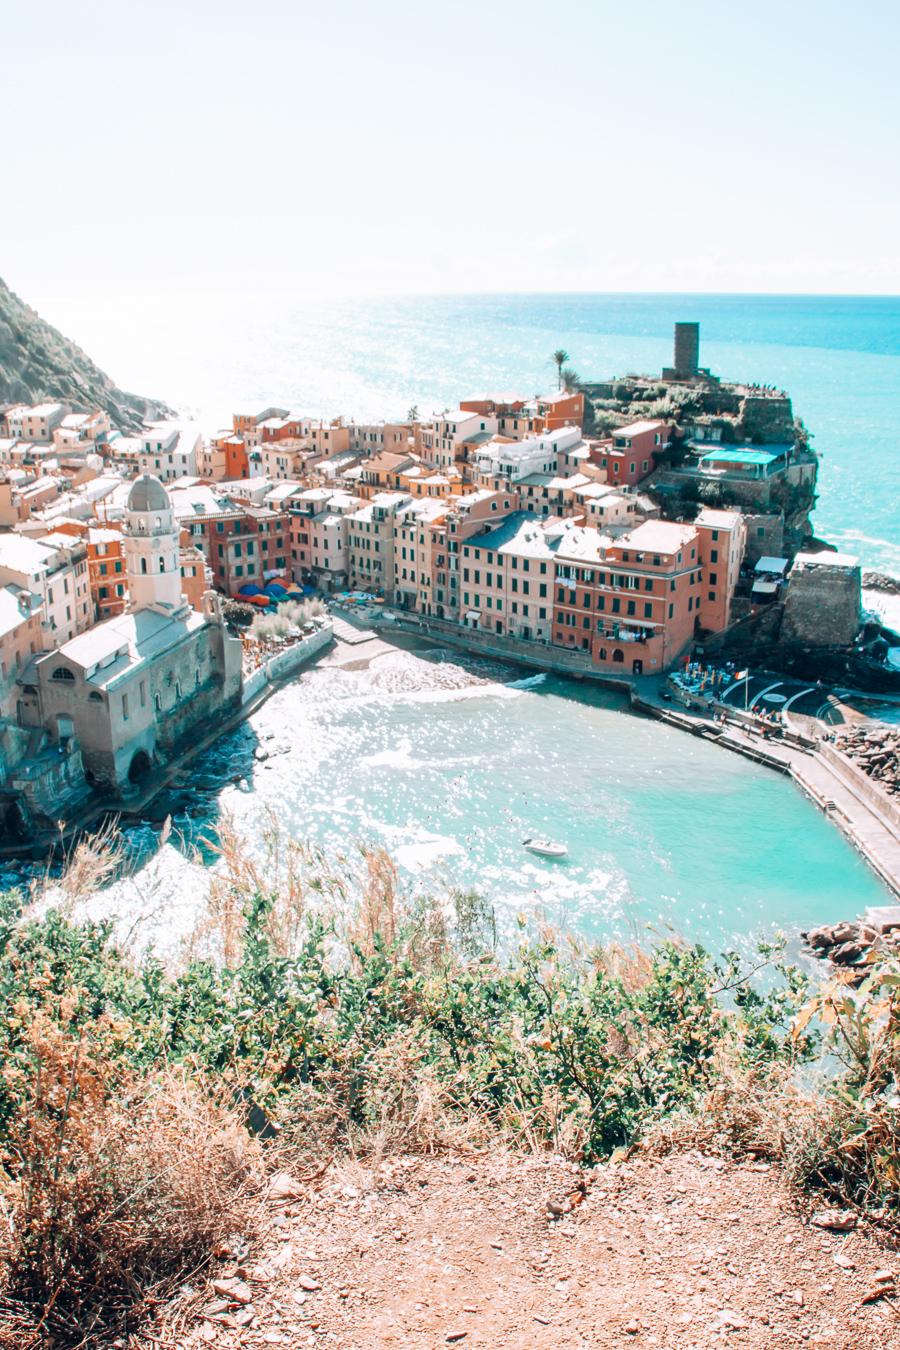 View of Vernazza in Cinque Terre